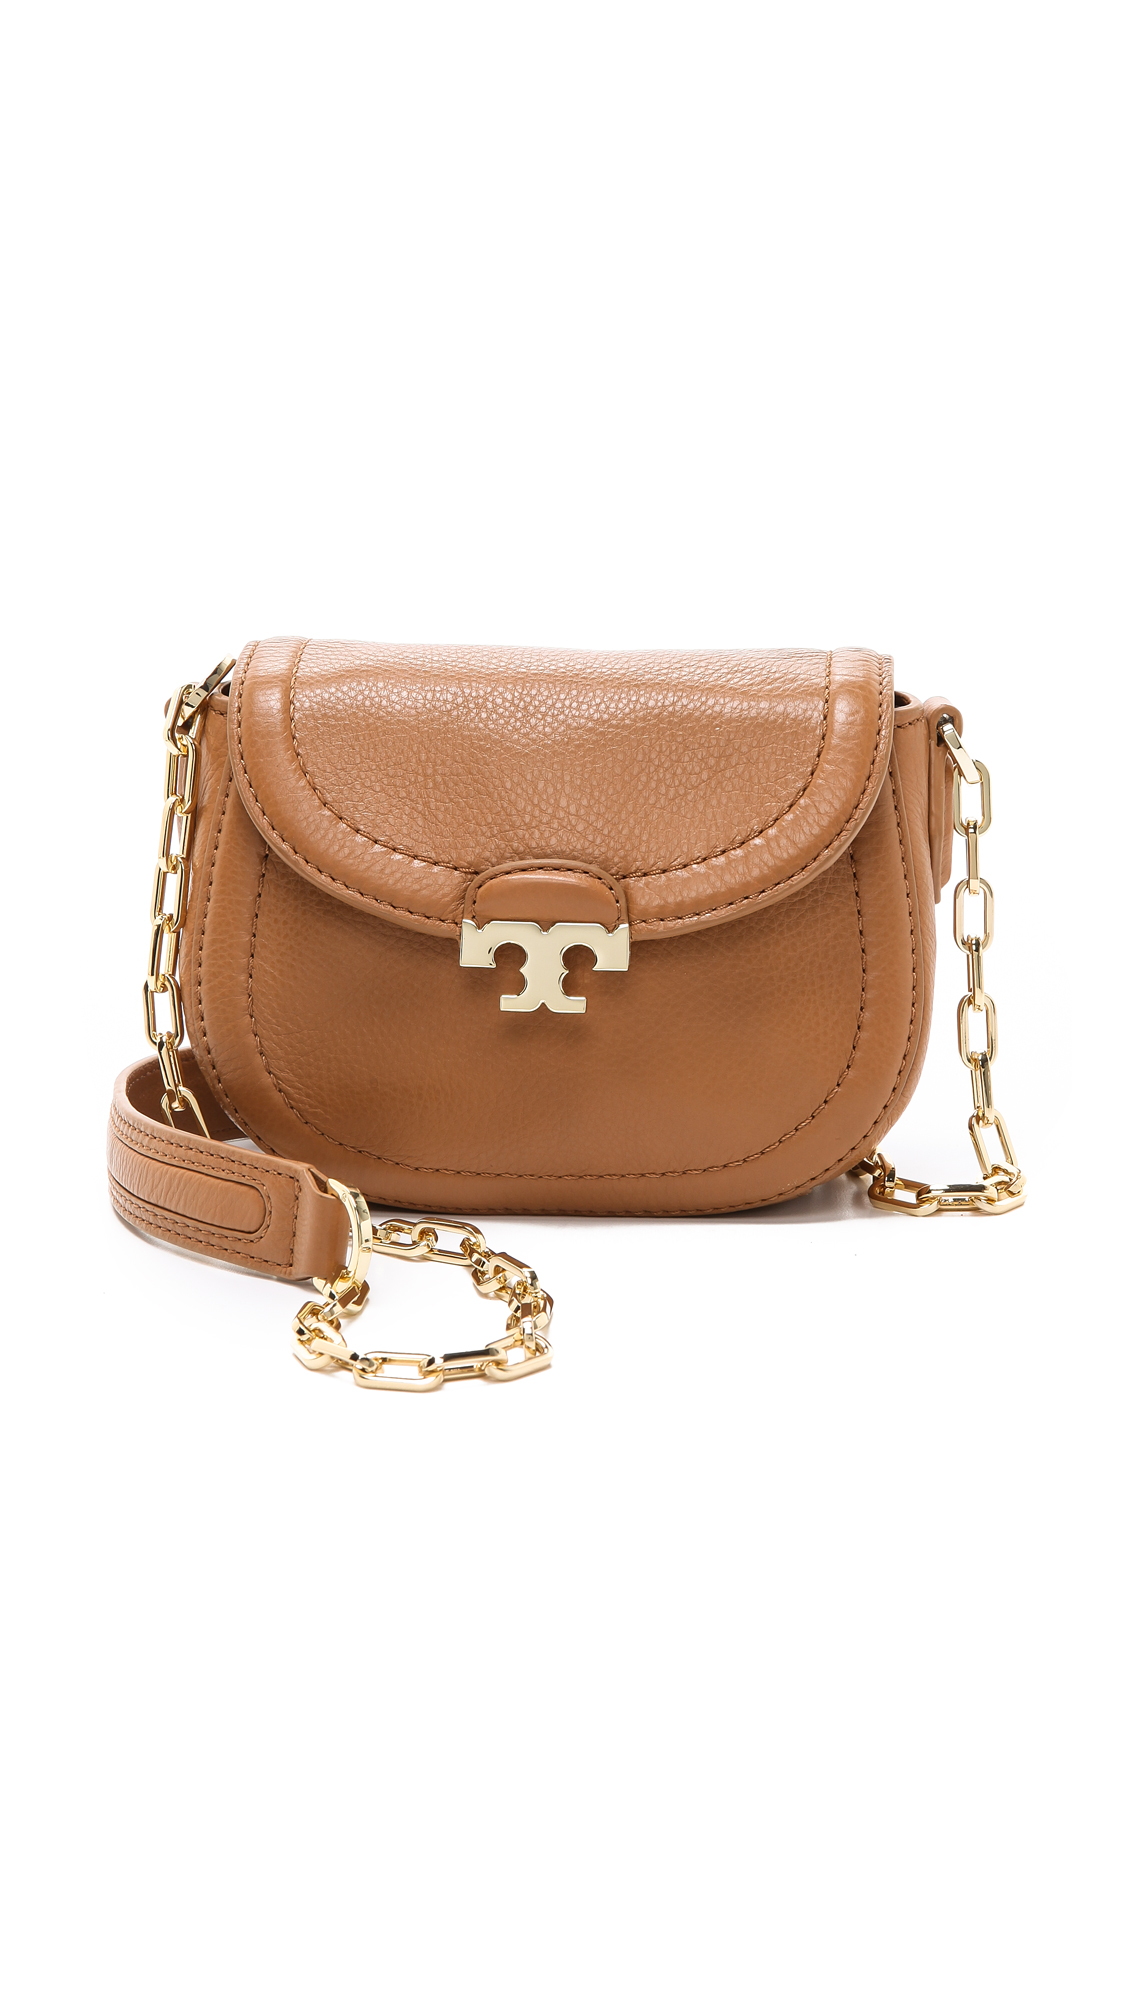 7555d2238da6 Lyst - Tory Burch Sammy Cross Body Bag in Brown